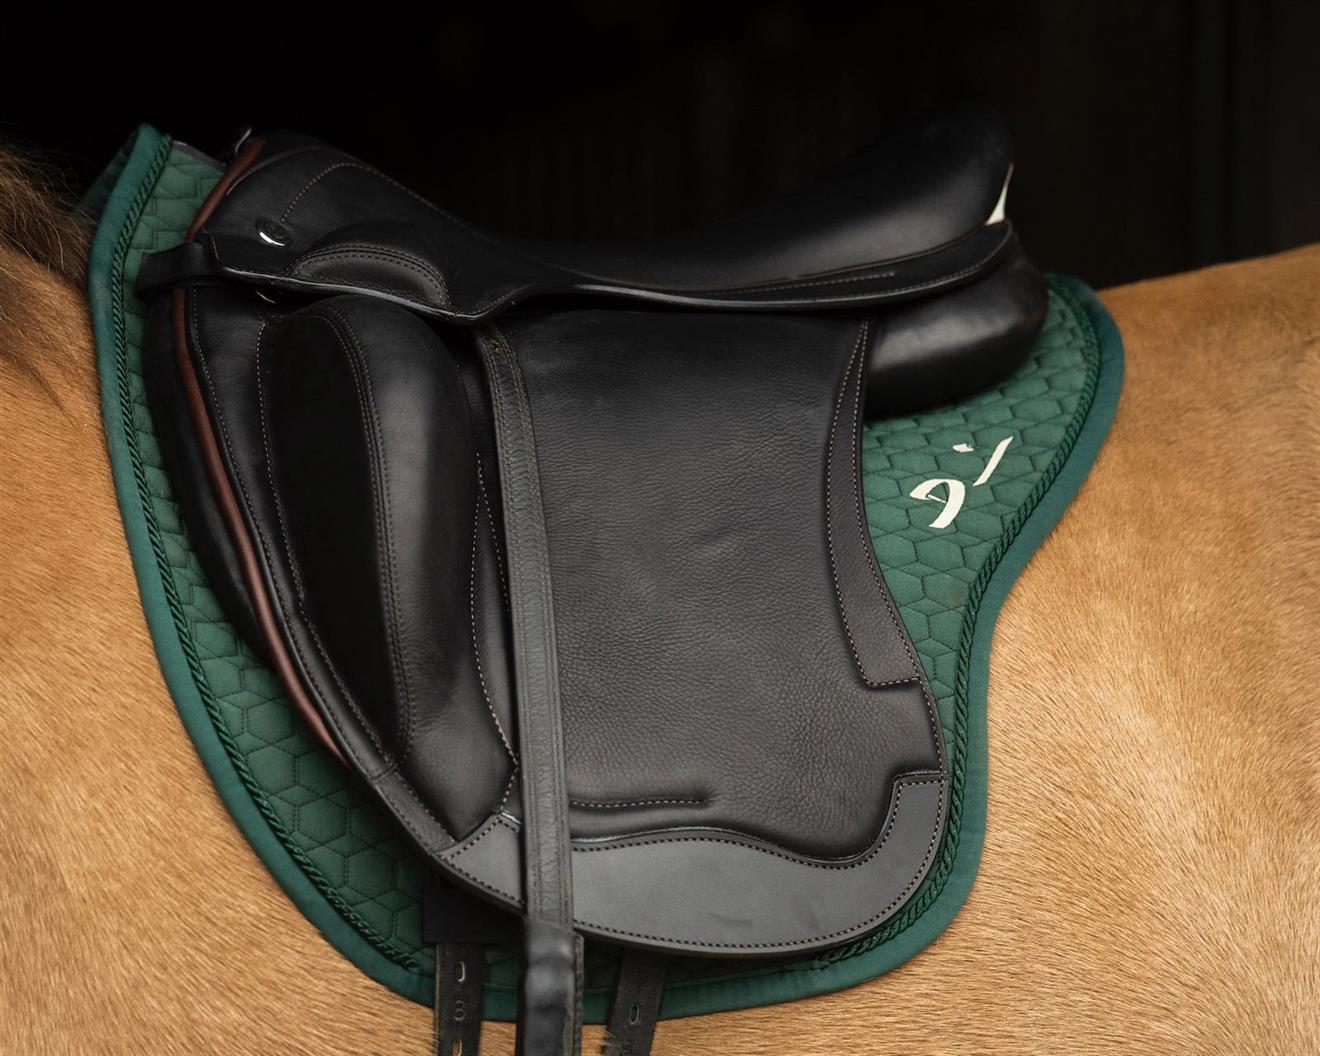 Schalock Denni Design Mattes Grön med Saddle-Fix